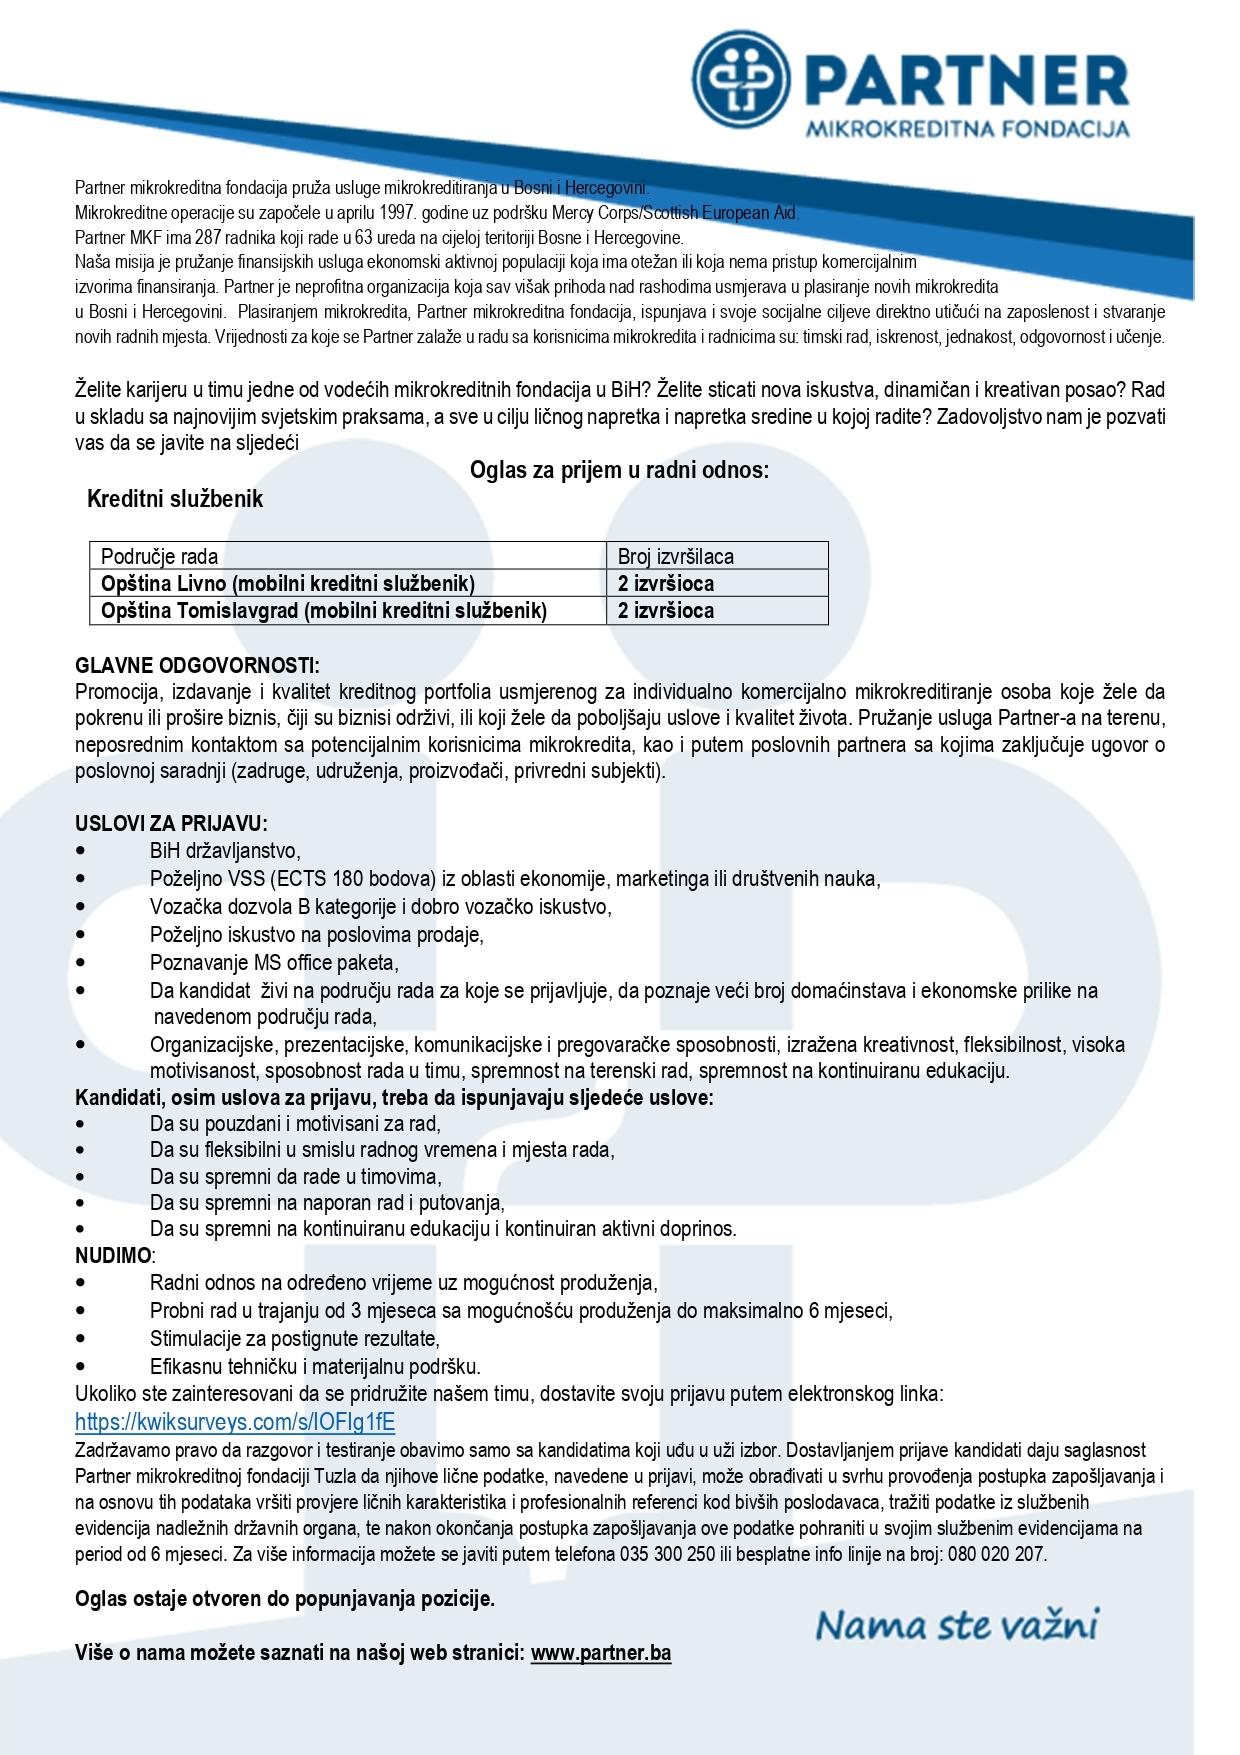 Oglas za prijem kreditnog službenika - Partner mikrokreditna organizacija